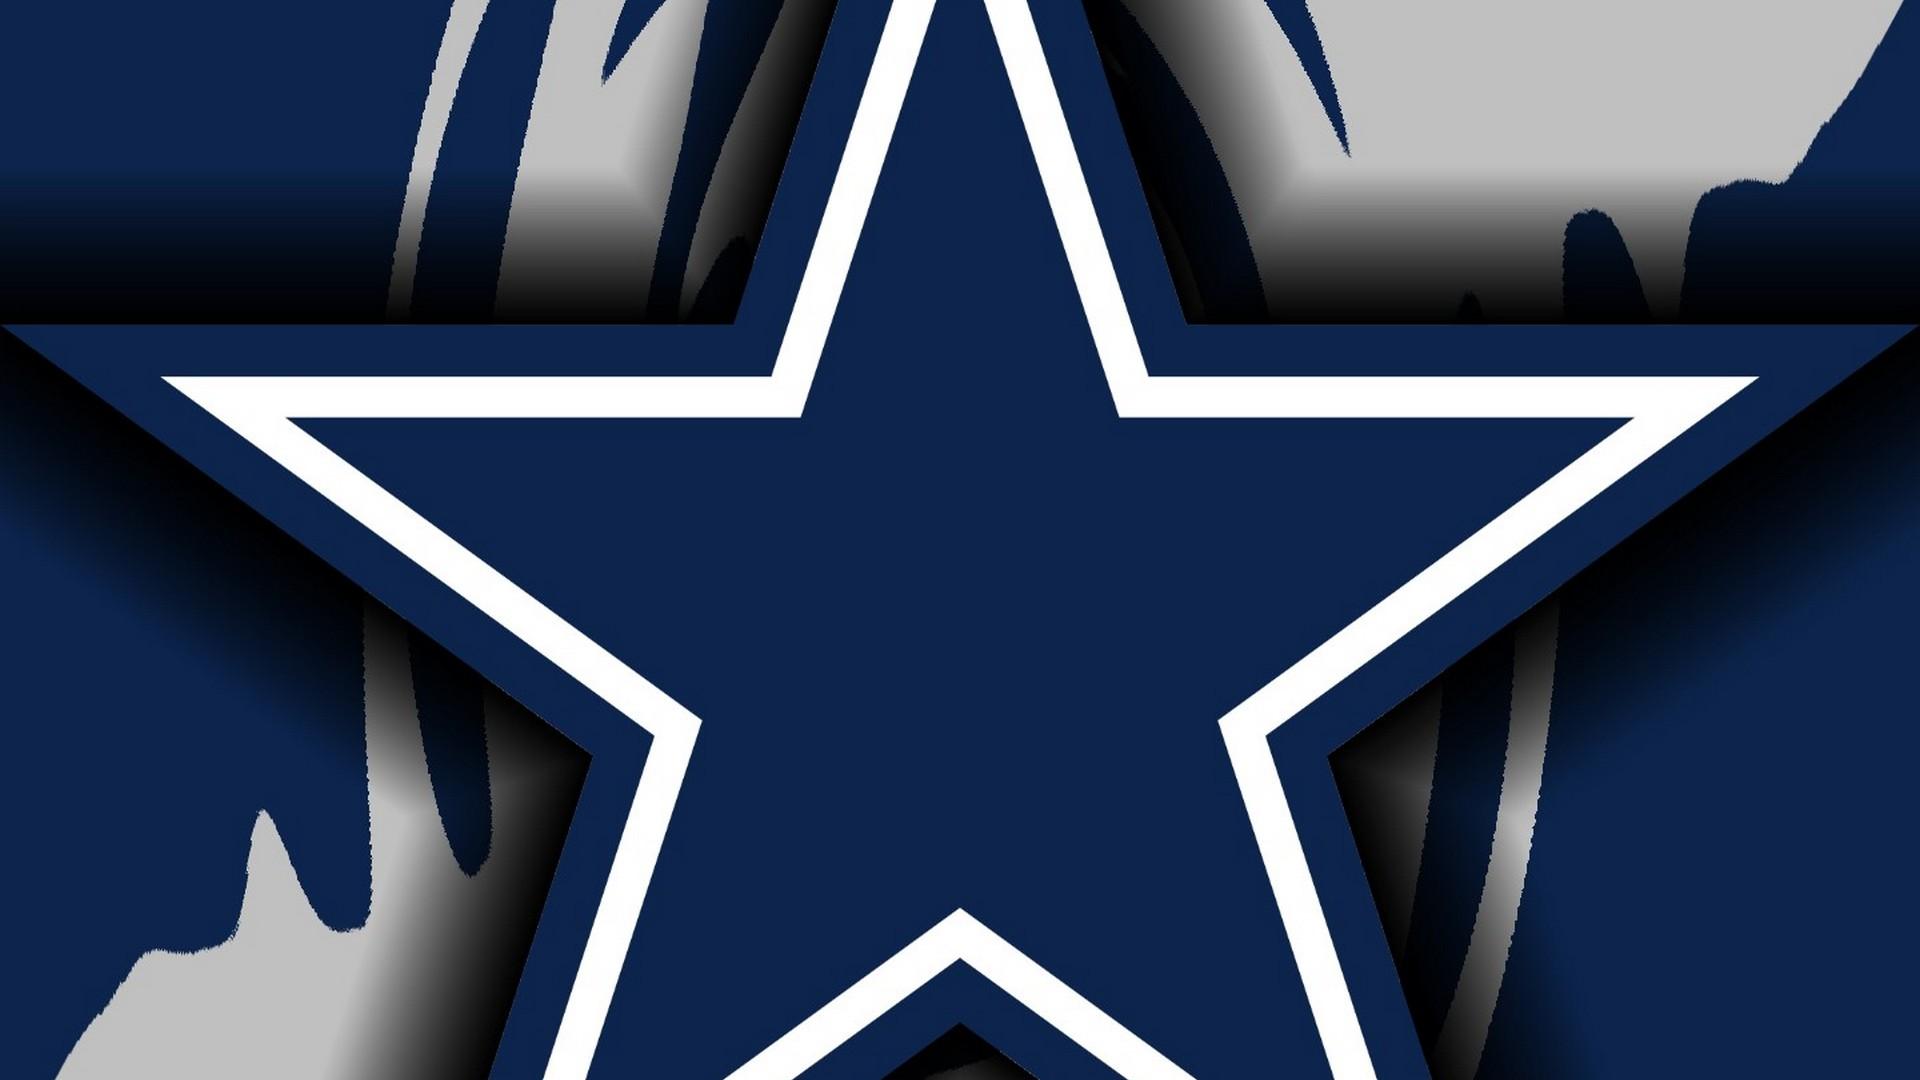 Wallpapers HD Dallas Cowboys 2020 NFL Football Wallpapers 1920x1080